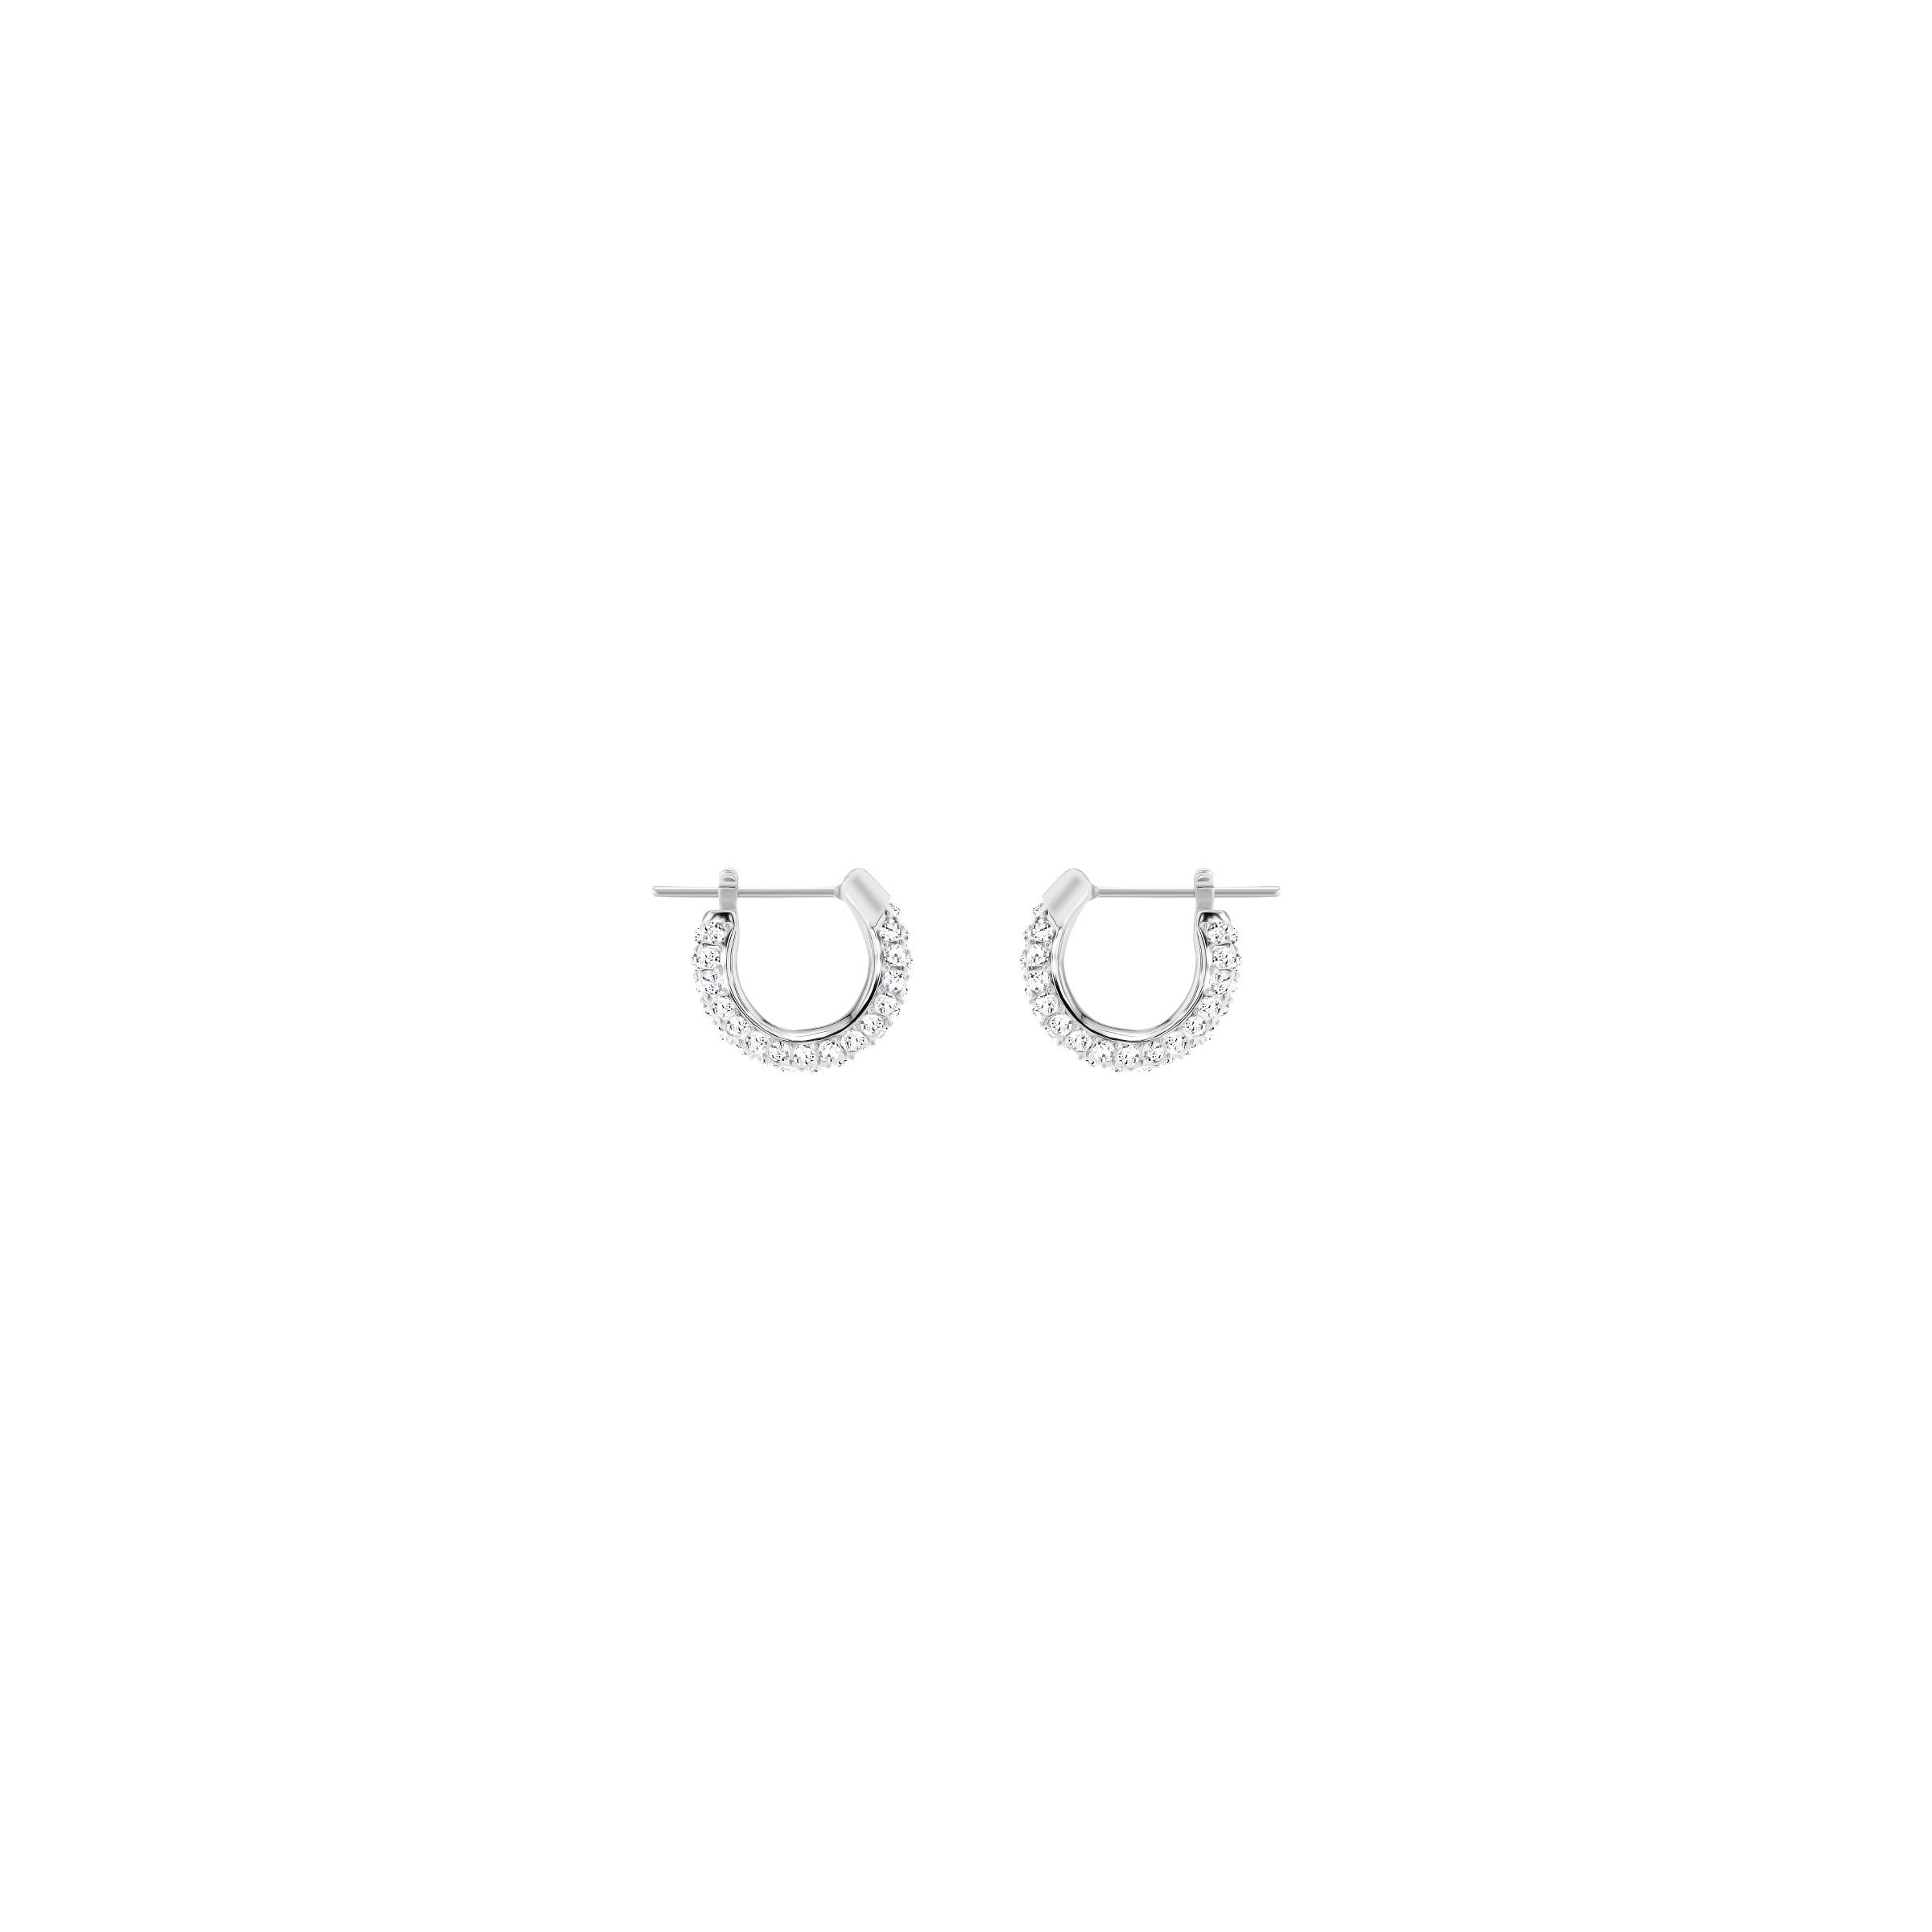 Boucles d'oreilles Stone, blanc, Métal rhodié, Swarovski